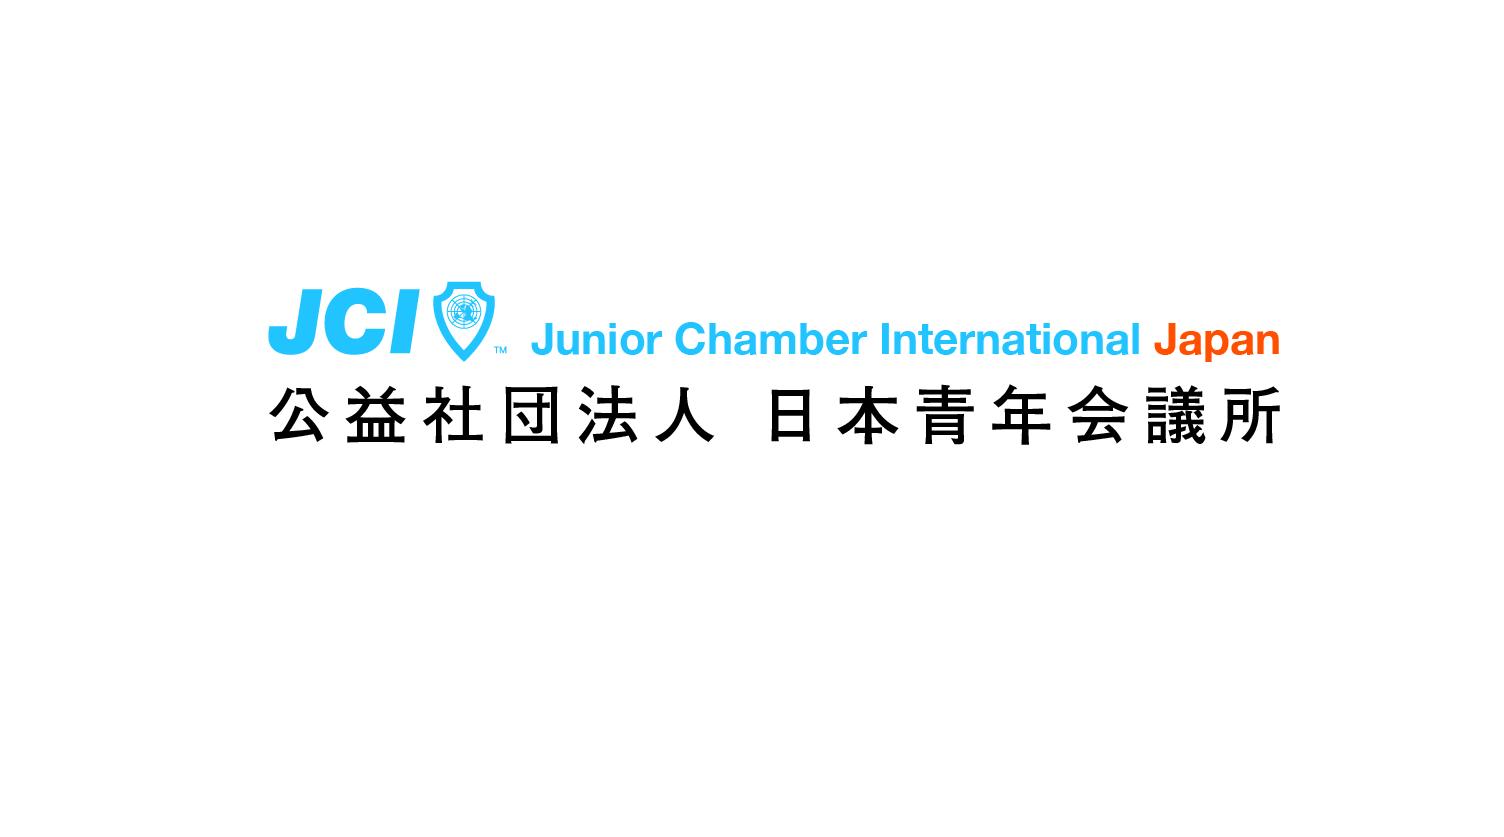 JCI-013青橙黒